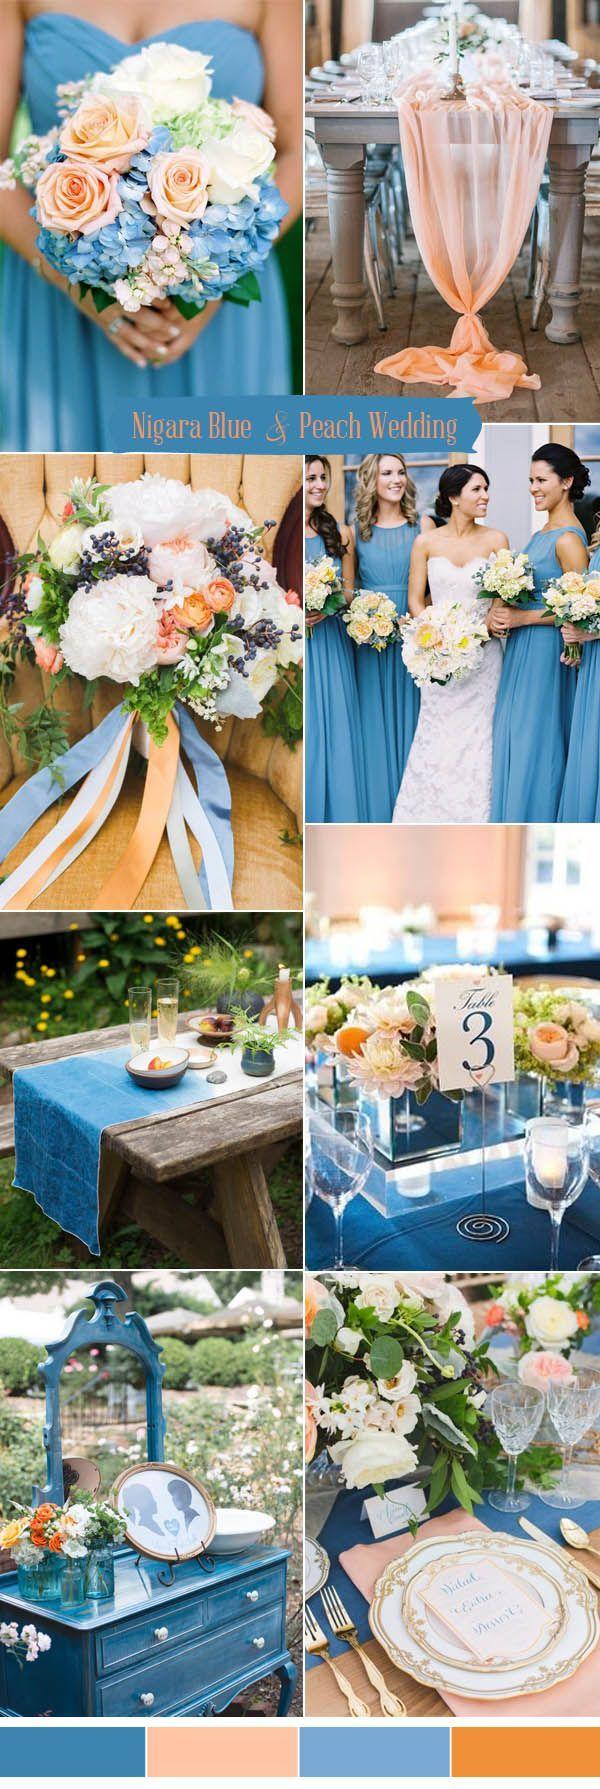 Pantone color nigara blue and peach wedding color ideas for